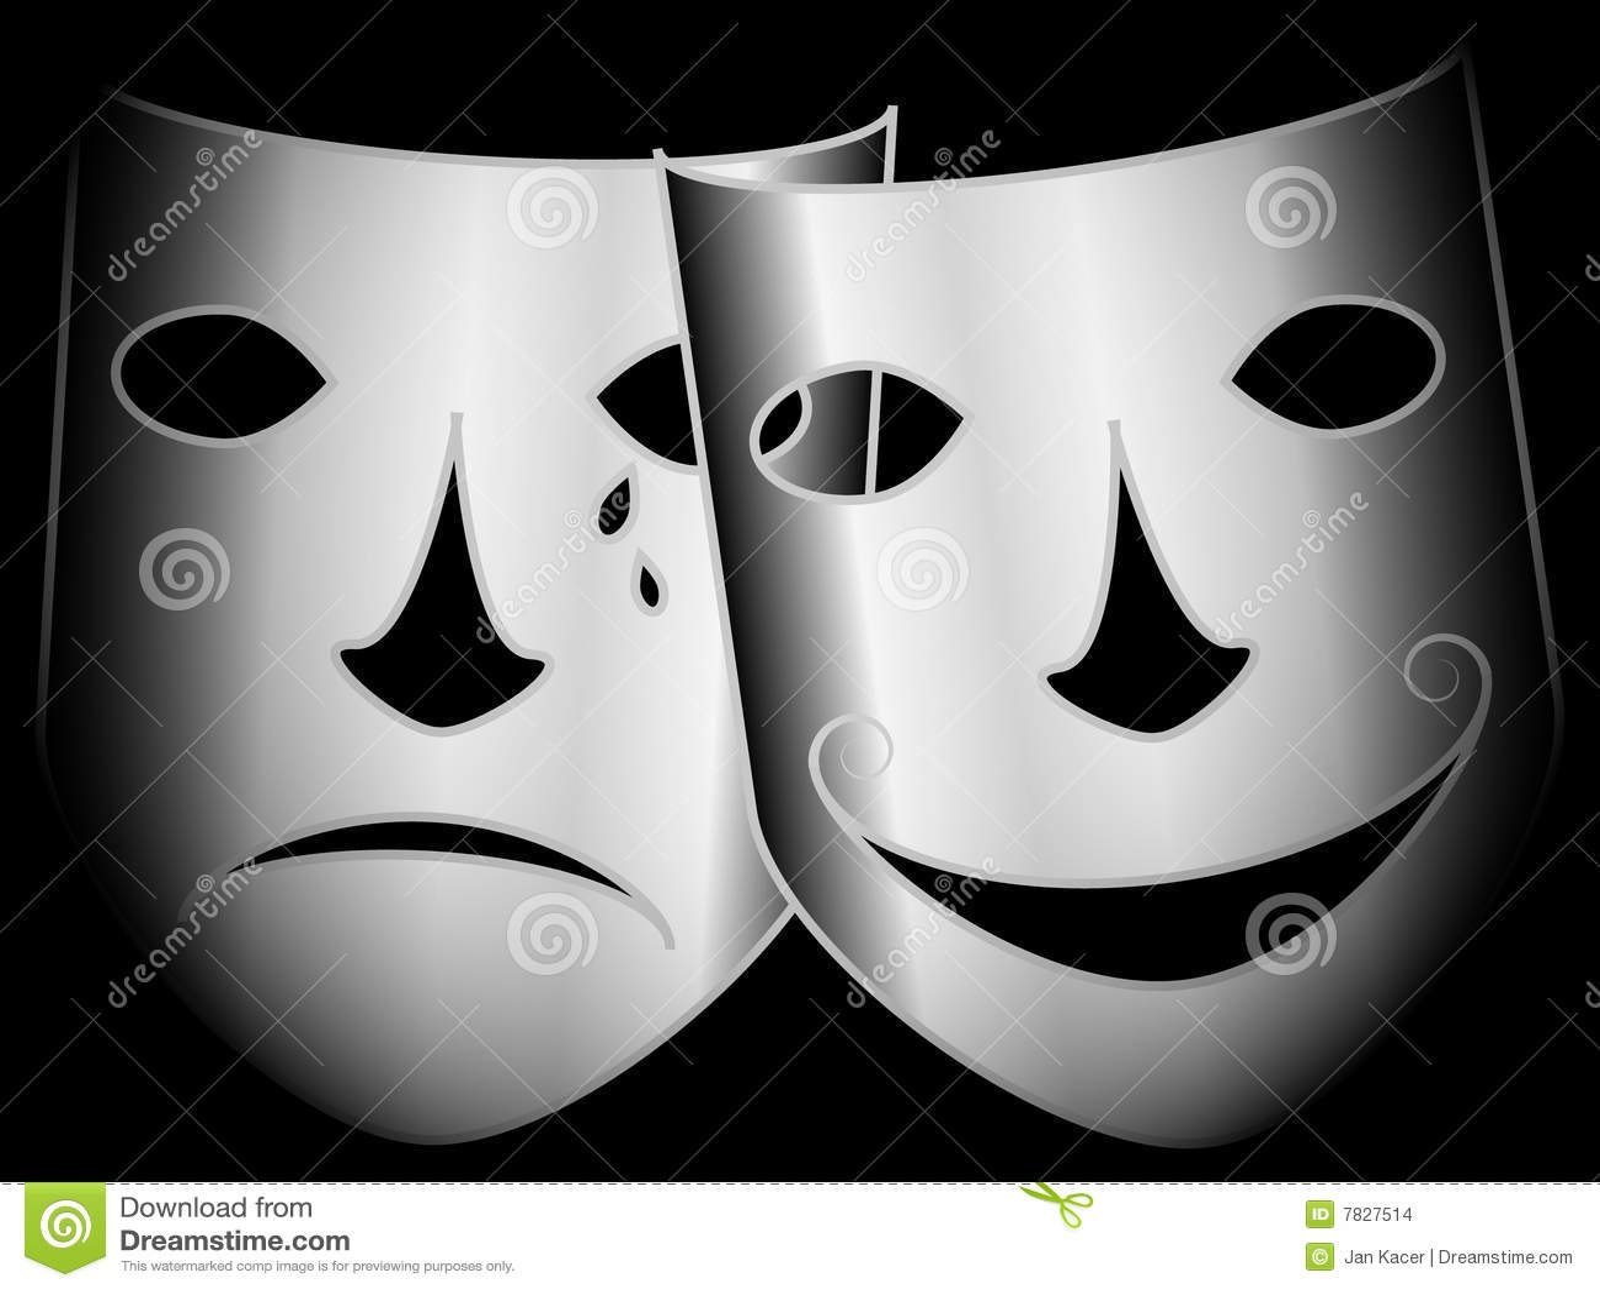 Happy and sad face masks happy and sad face tattoos - Happy Face Sad Mask Tattoo Page 5 Two Face 7827514